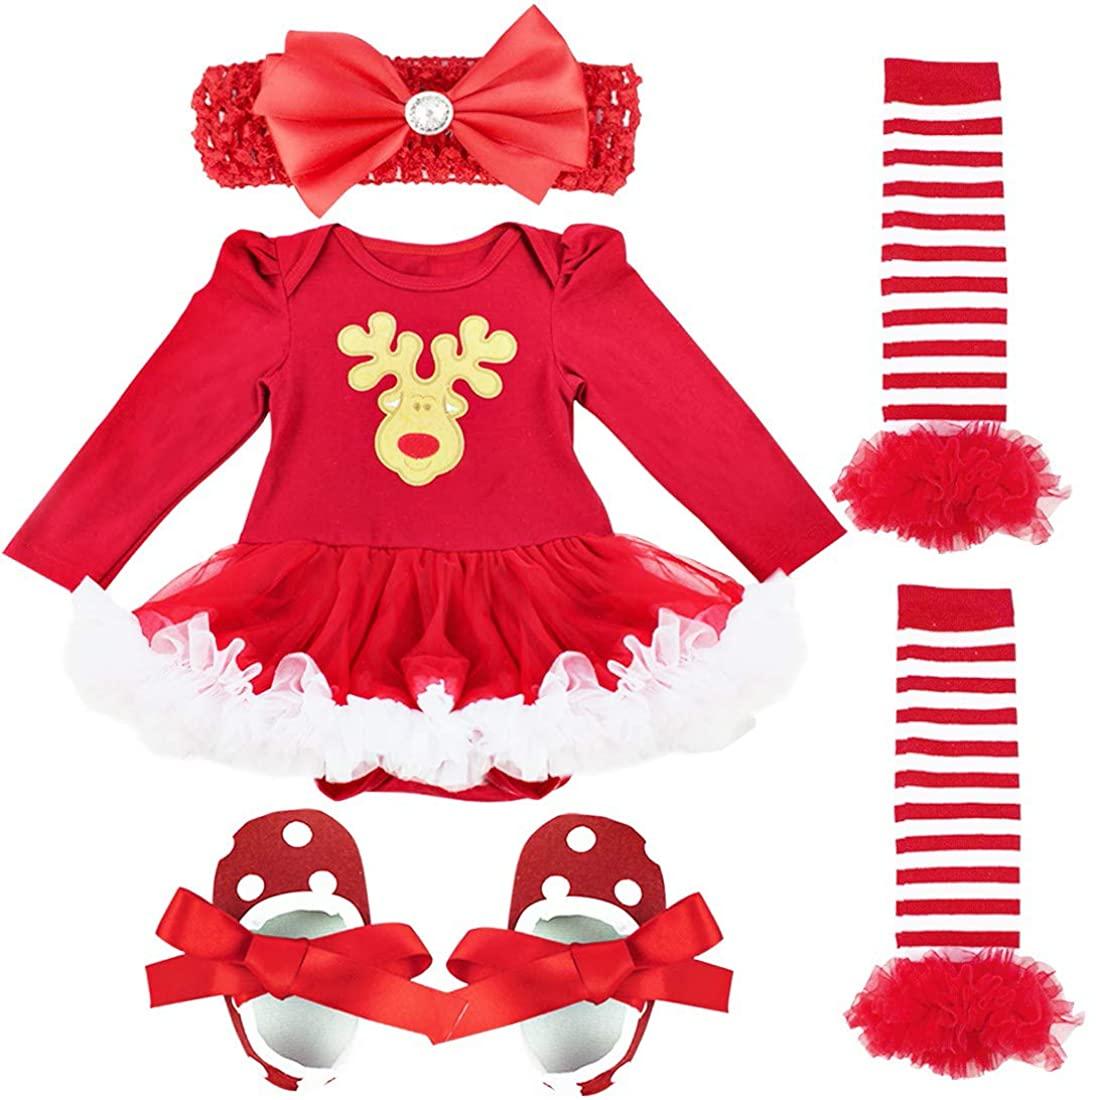 TiaoBug Toddler Baby Girls Deer Christmas Outfits Xmas Romper Dress+Leg Warmer+Shoes+Headband 4Pcs Winter Santa Clothes Set